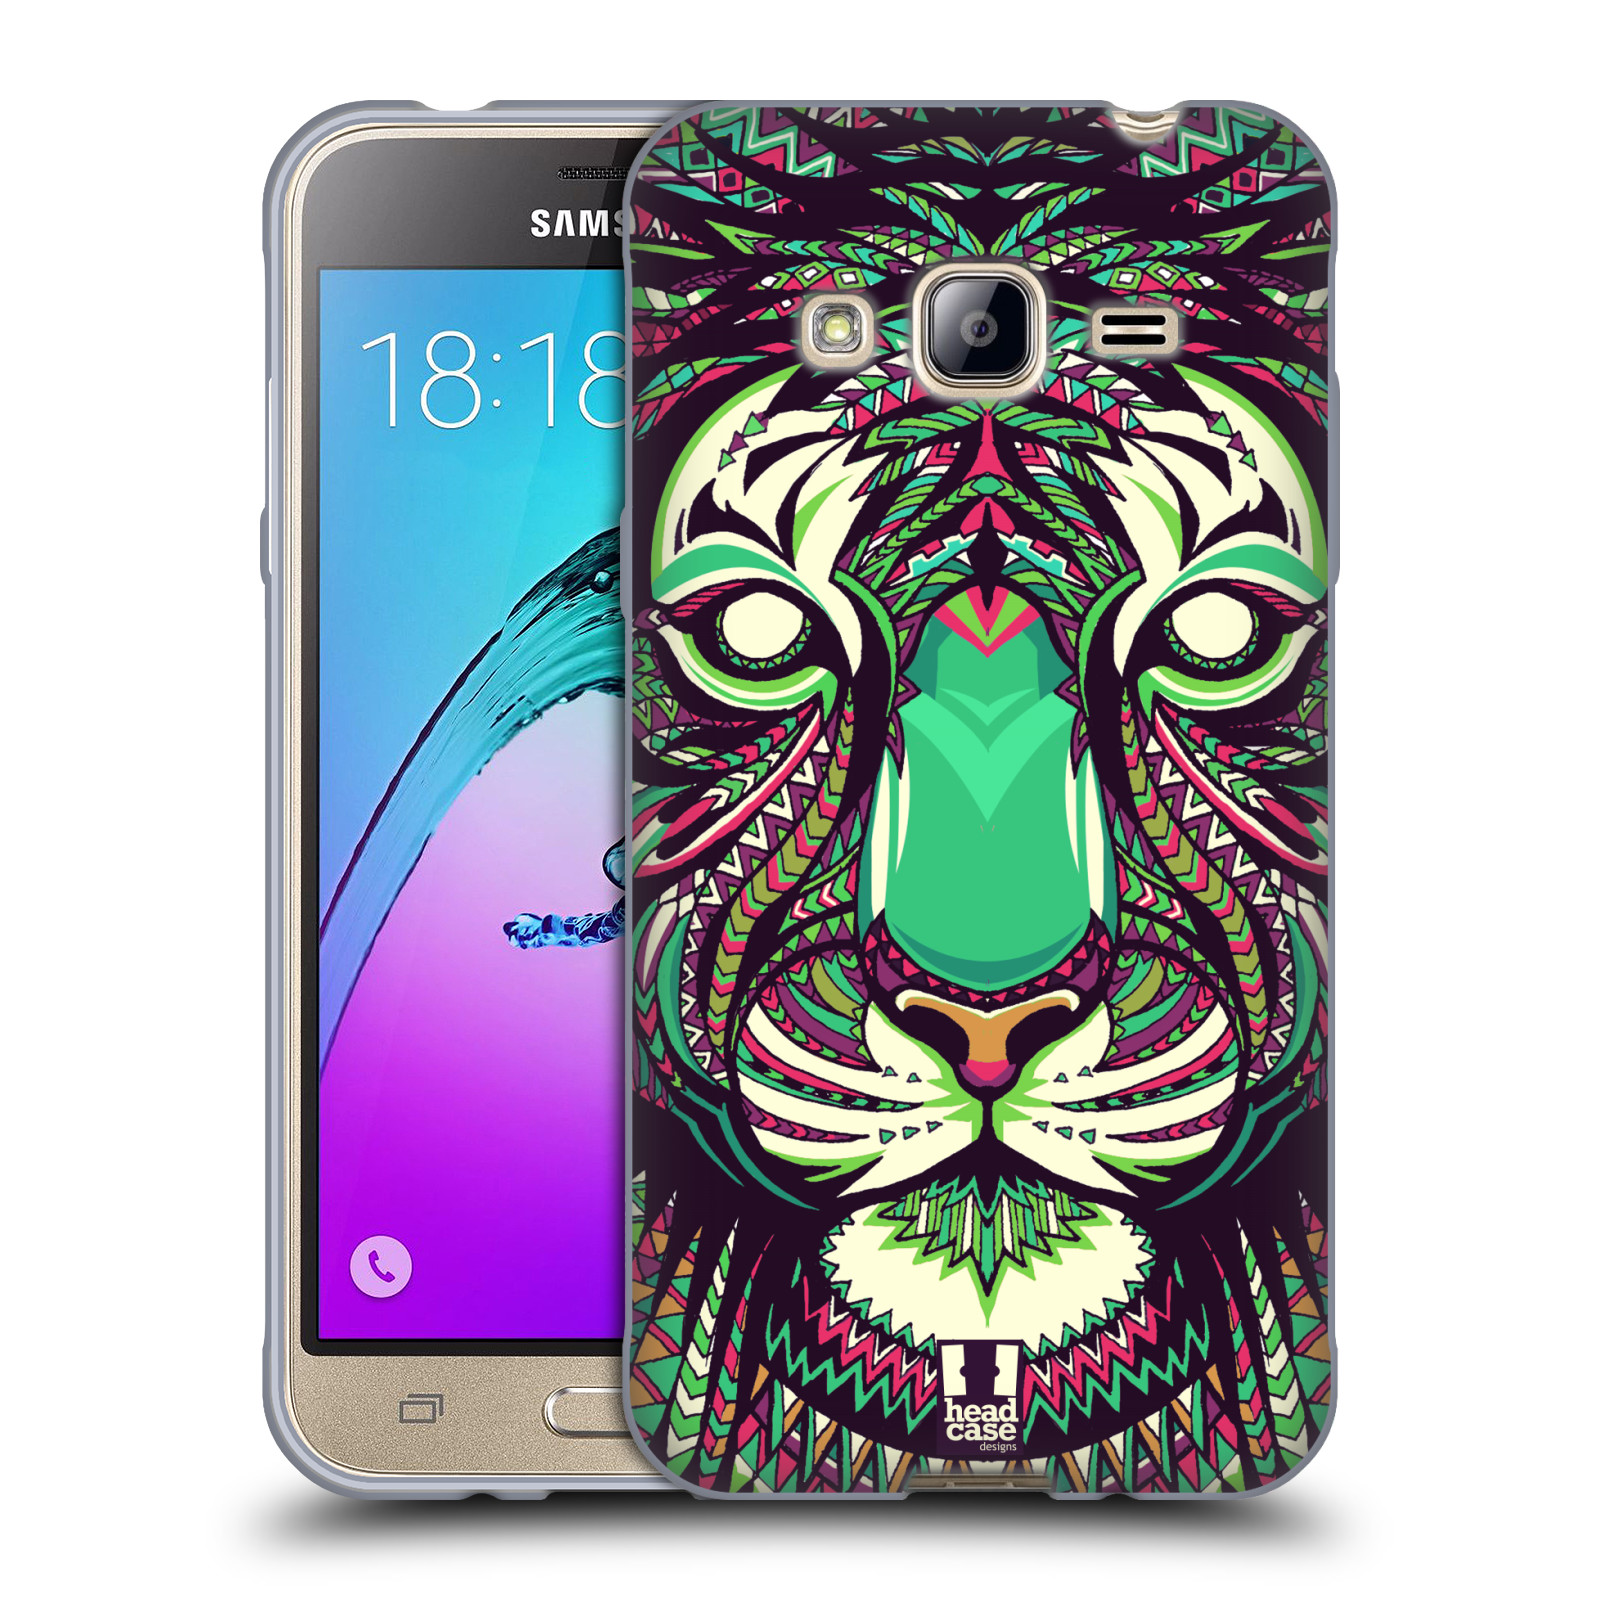 Silikonové pouzdro na mobil Samsung Galaxy J3 (2016) HEAD CASE AZTEC TYGR